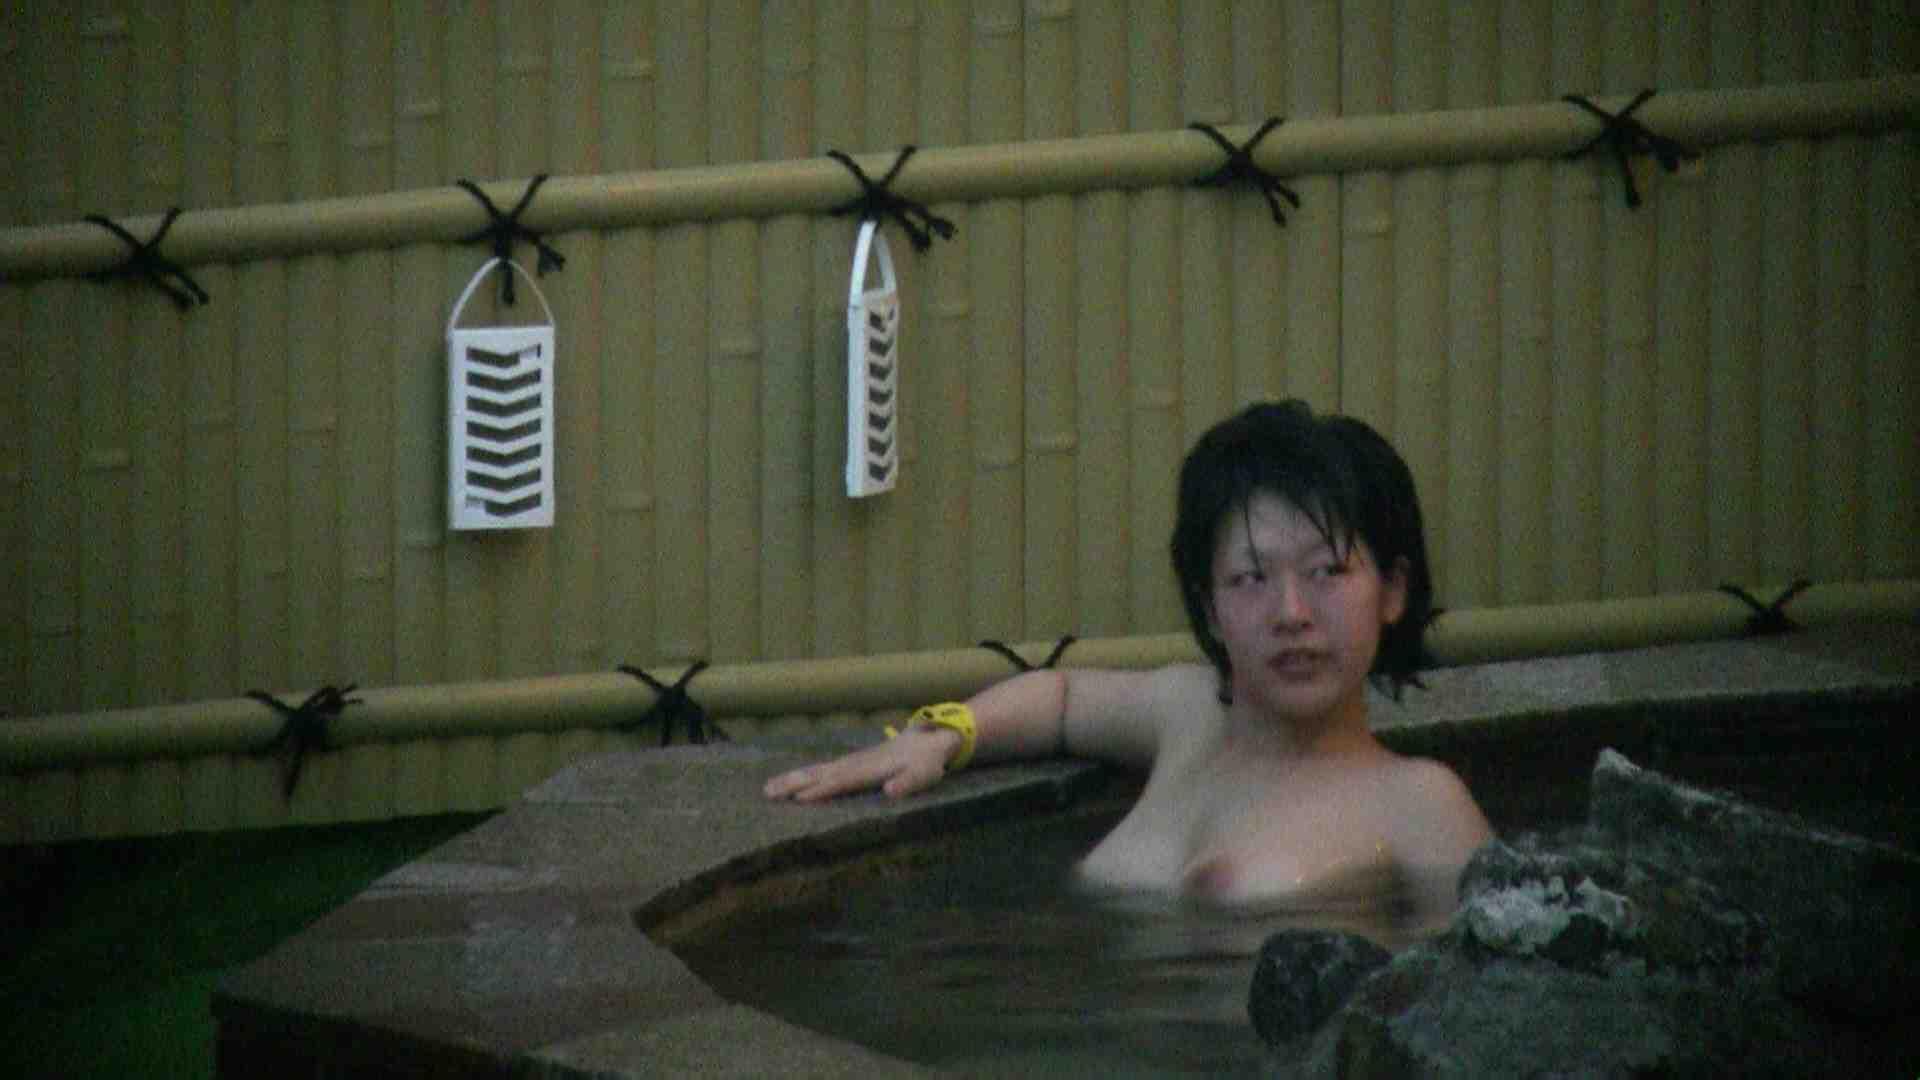 Aquaな露天風呂Vol.05【VIP】 露天風呂編  112PIX 46